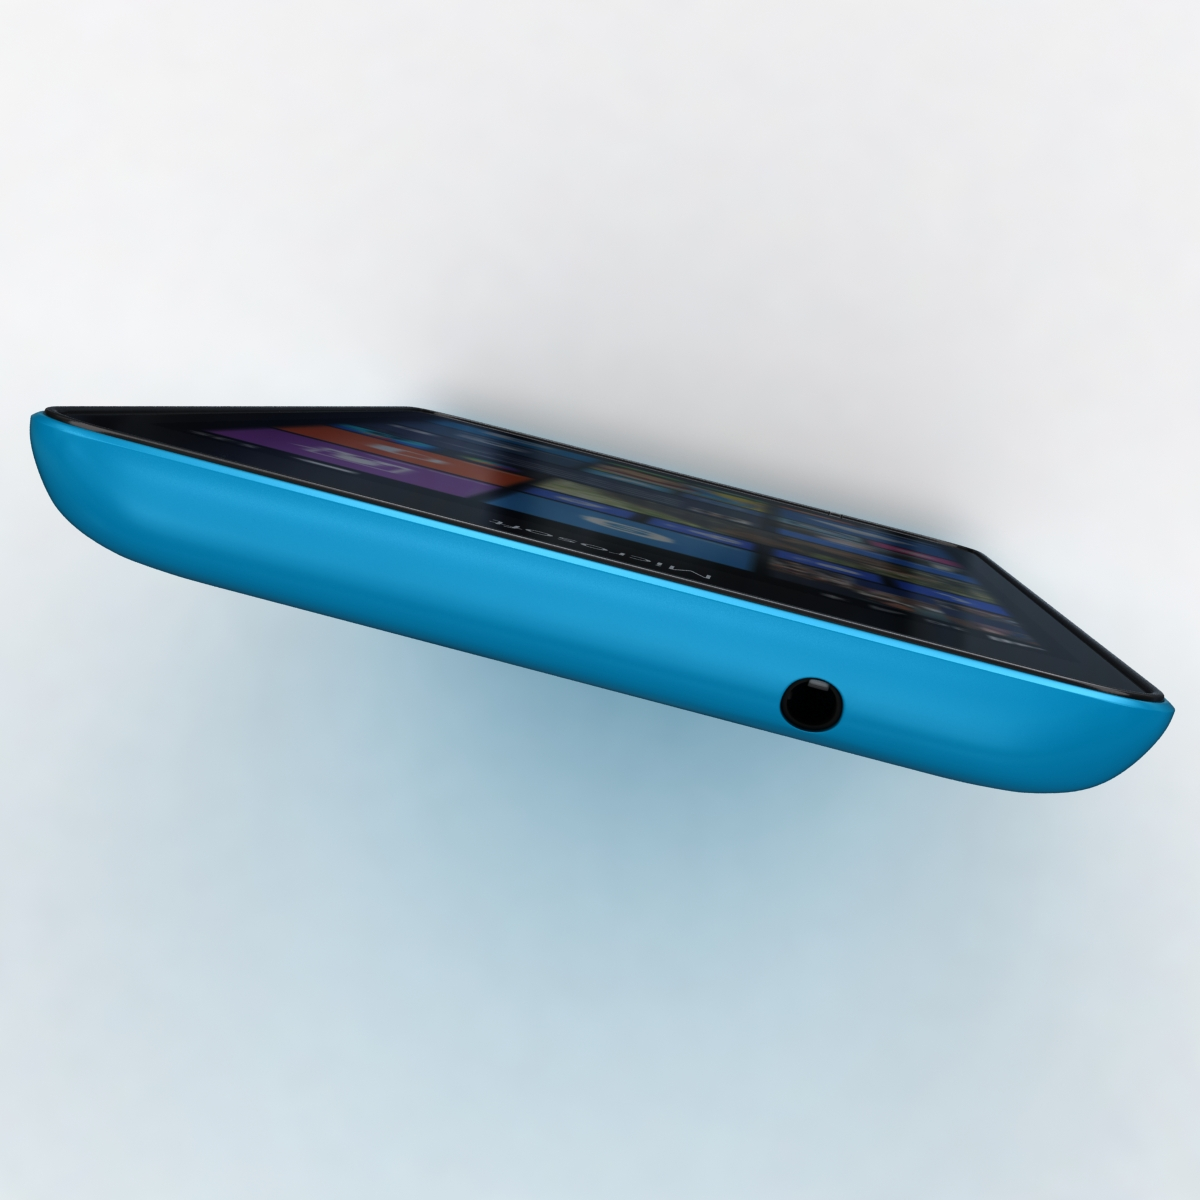 microsoft lumia 535 and dual sim blue 3d model 3ds max fbx c4d obj 204535